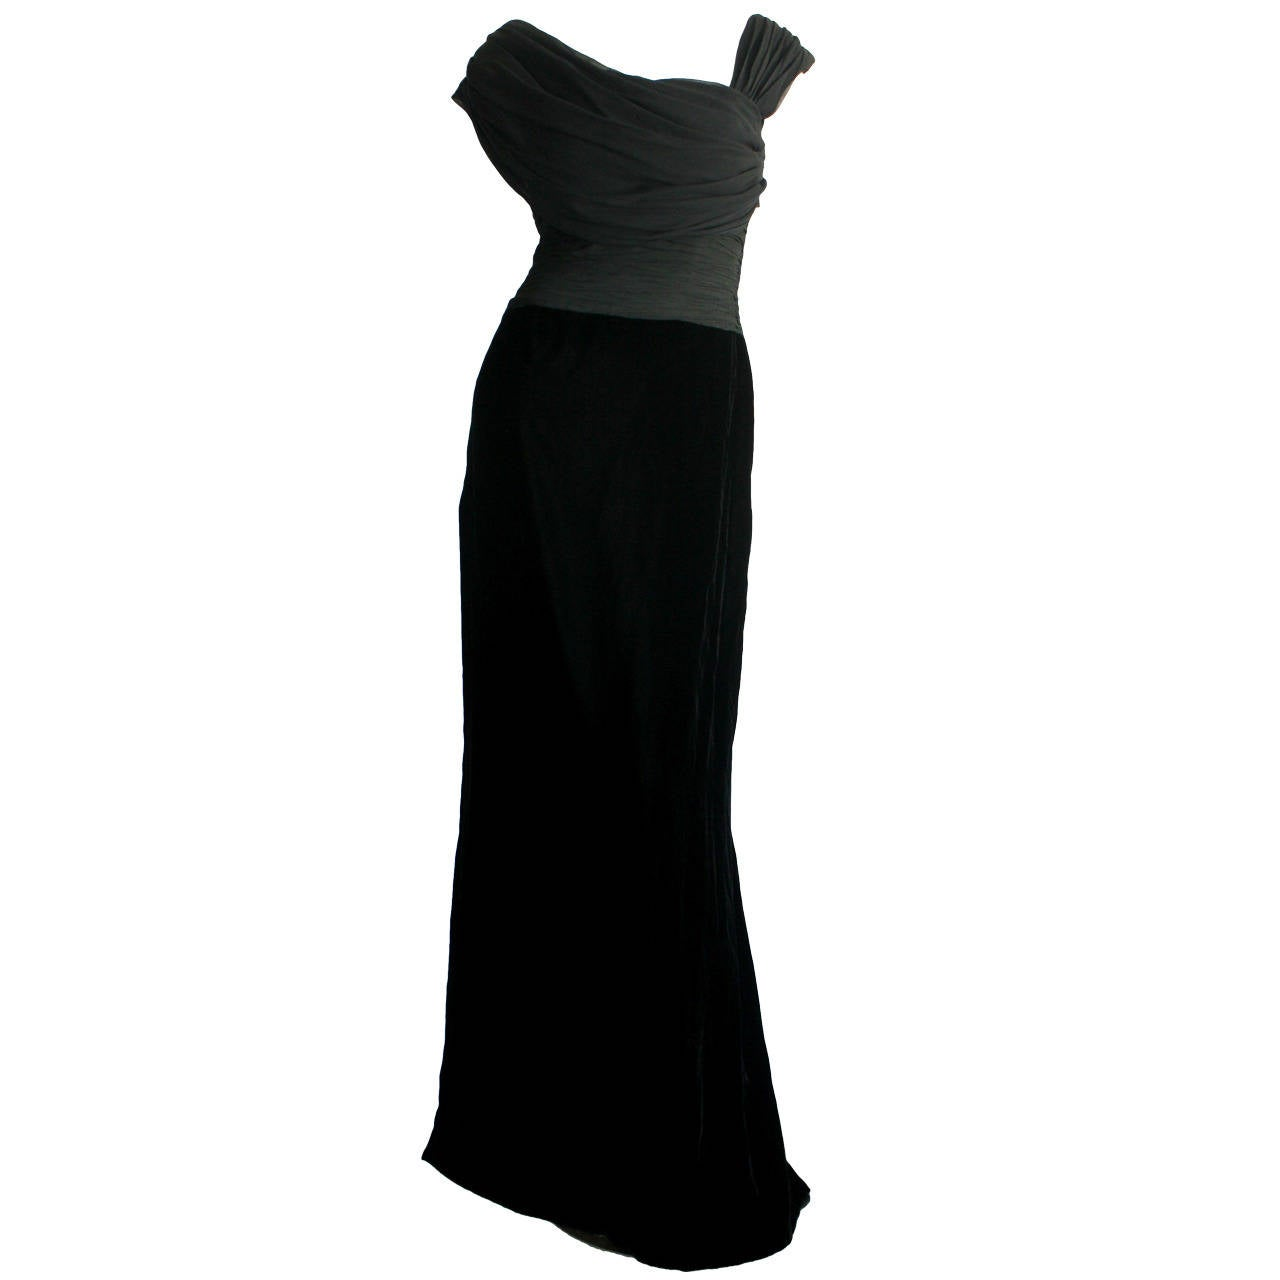 Remarkable Vintage Oscar de la Renta Black Velvet & Chiffon Grecian Gown 1